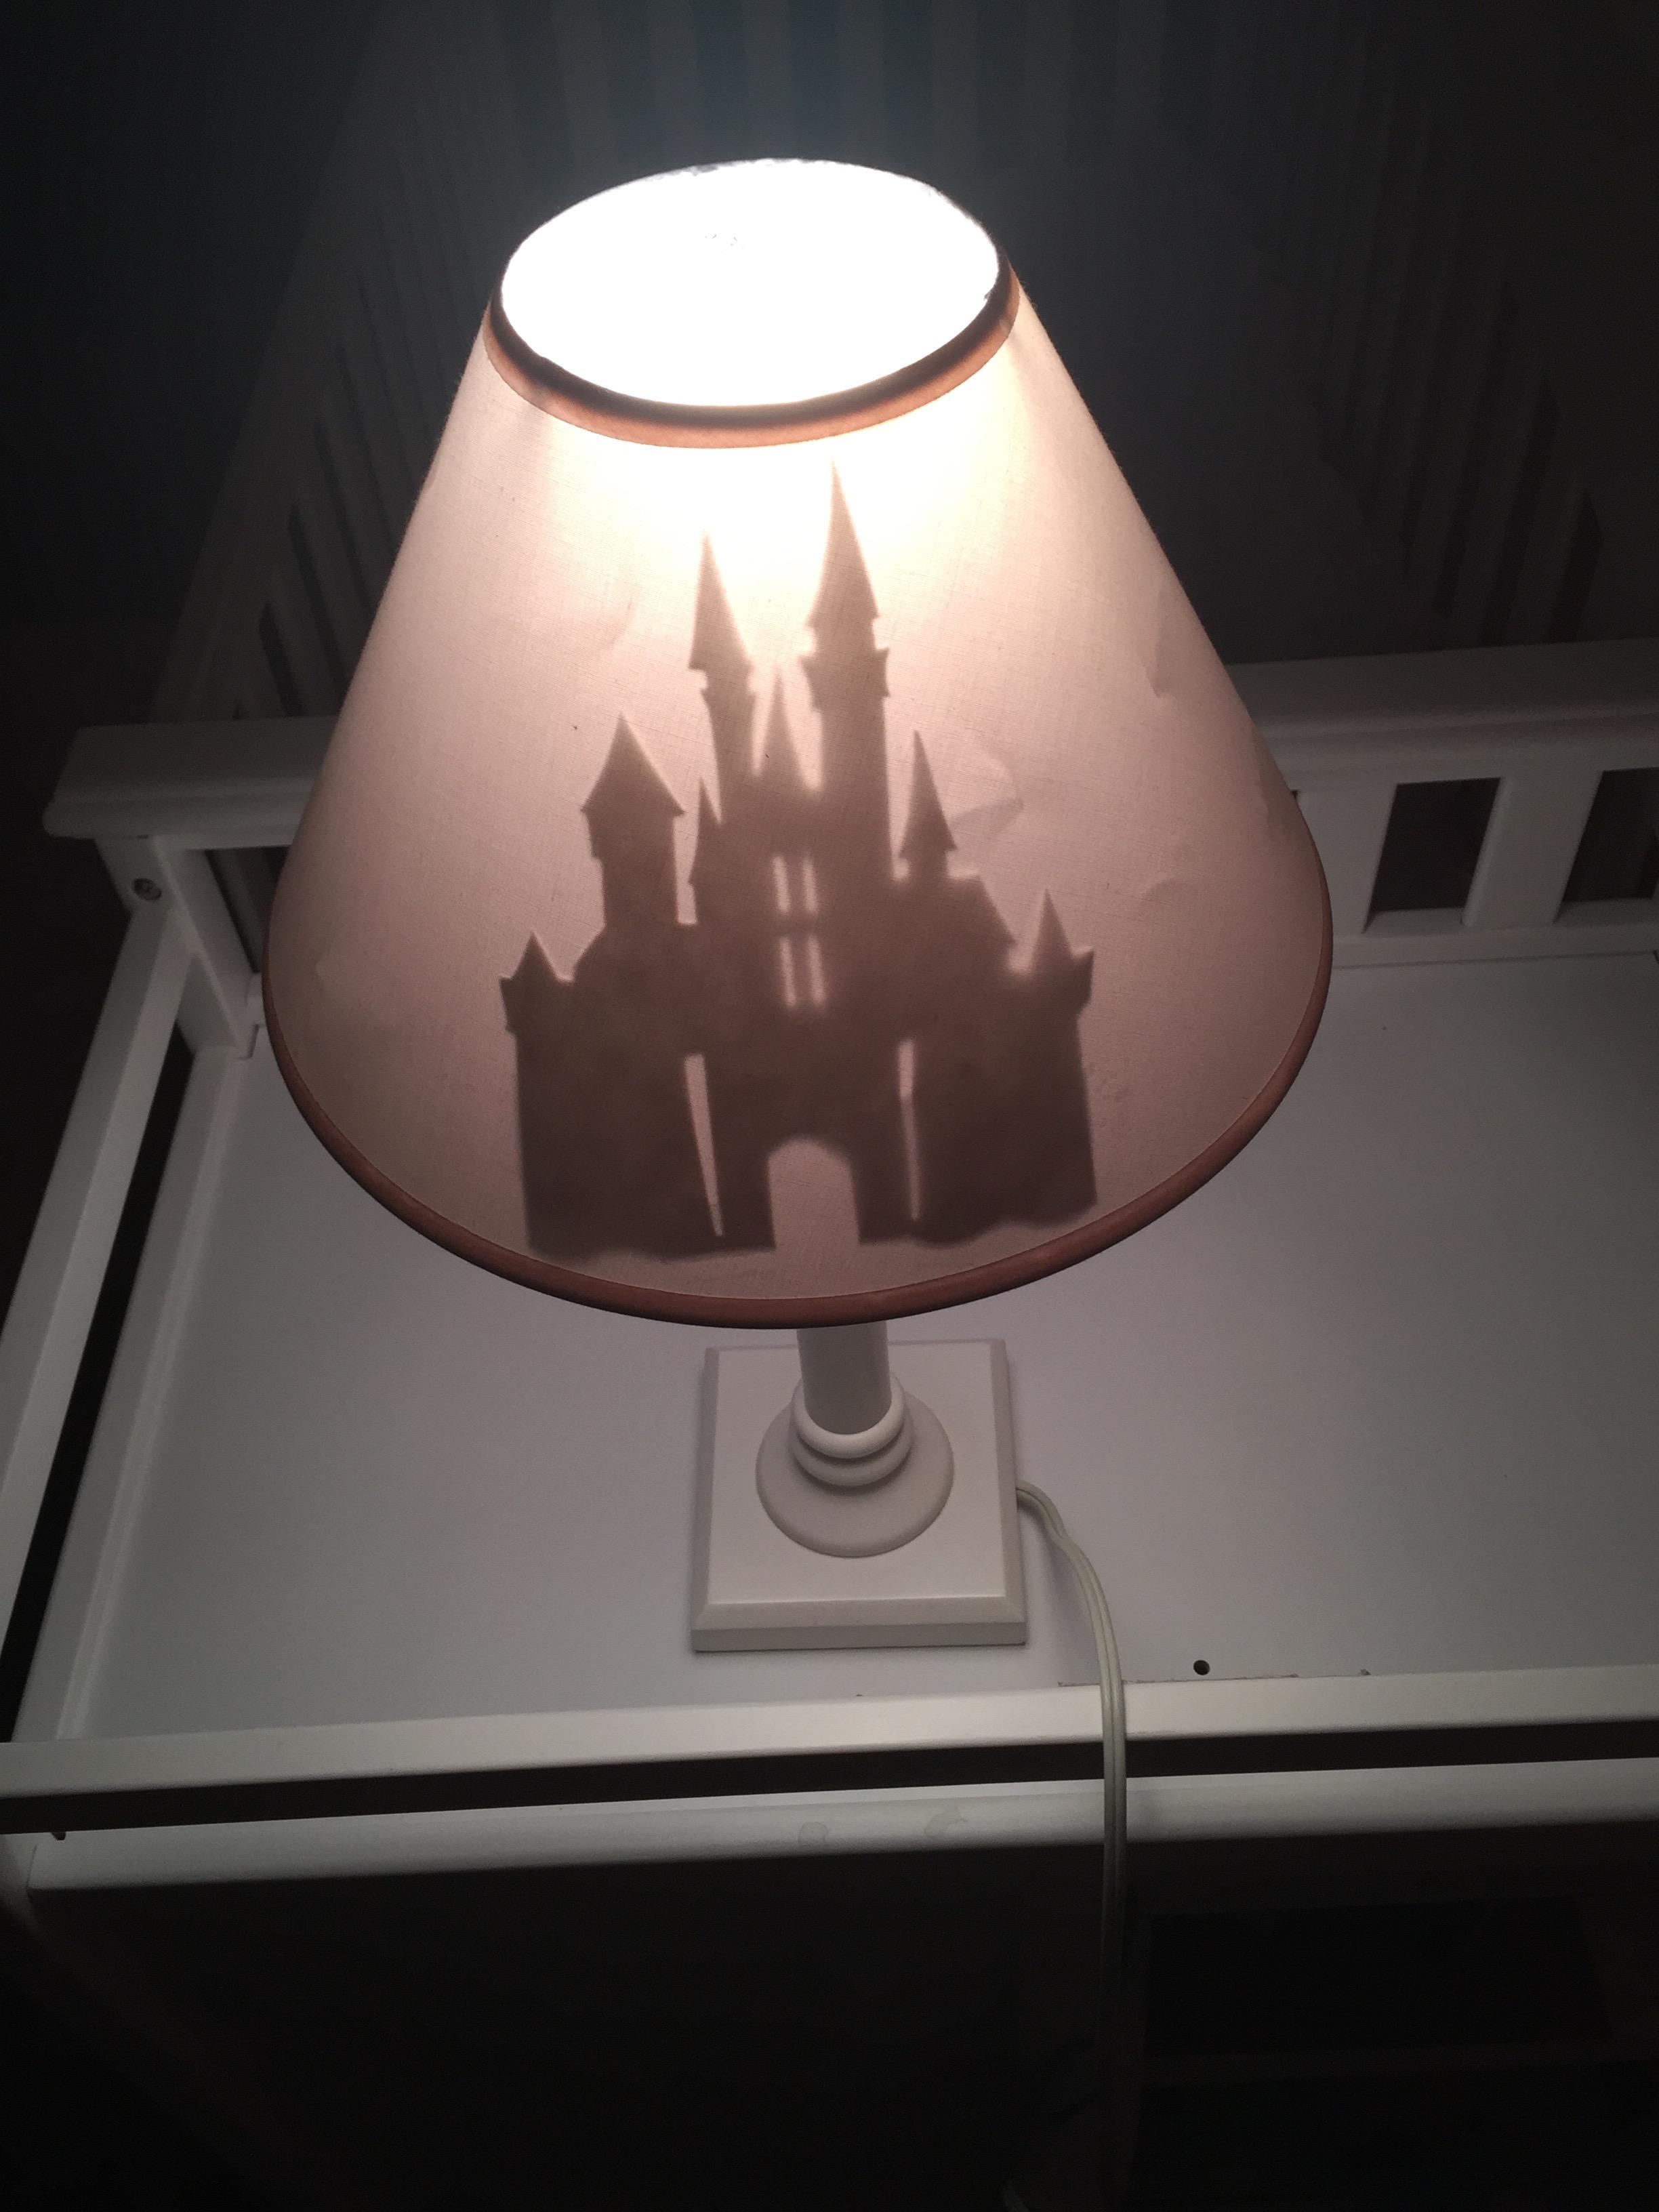 Diy disney lamp shade touringplans blog photo angela dahlgren mozeypictures Images